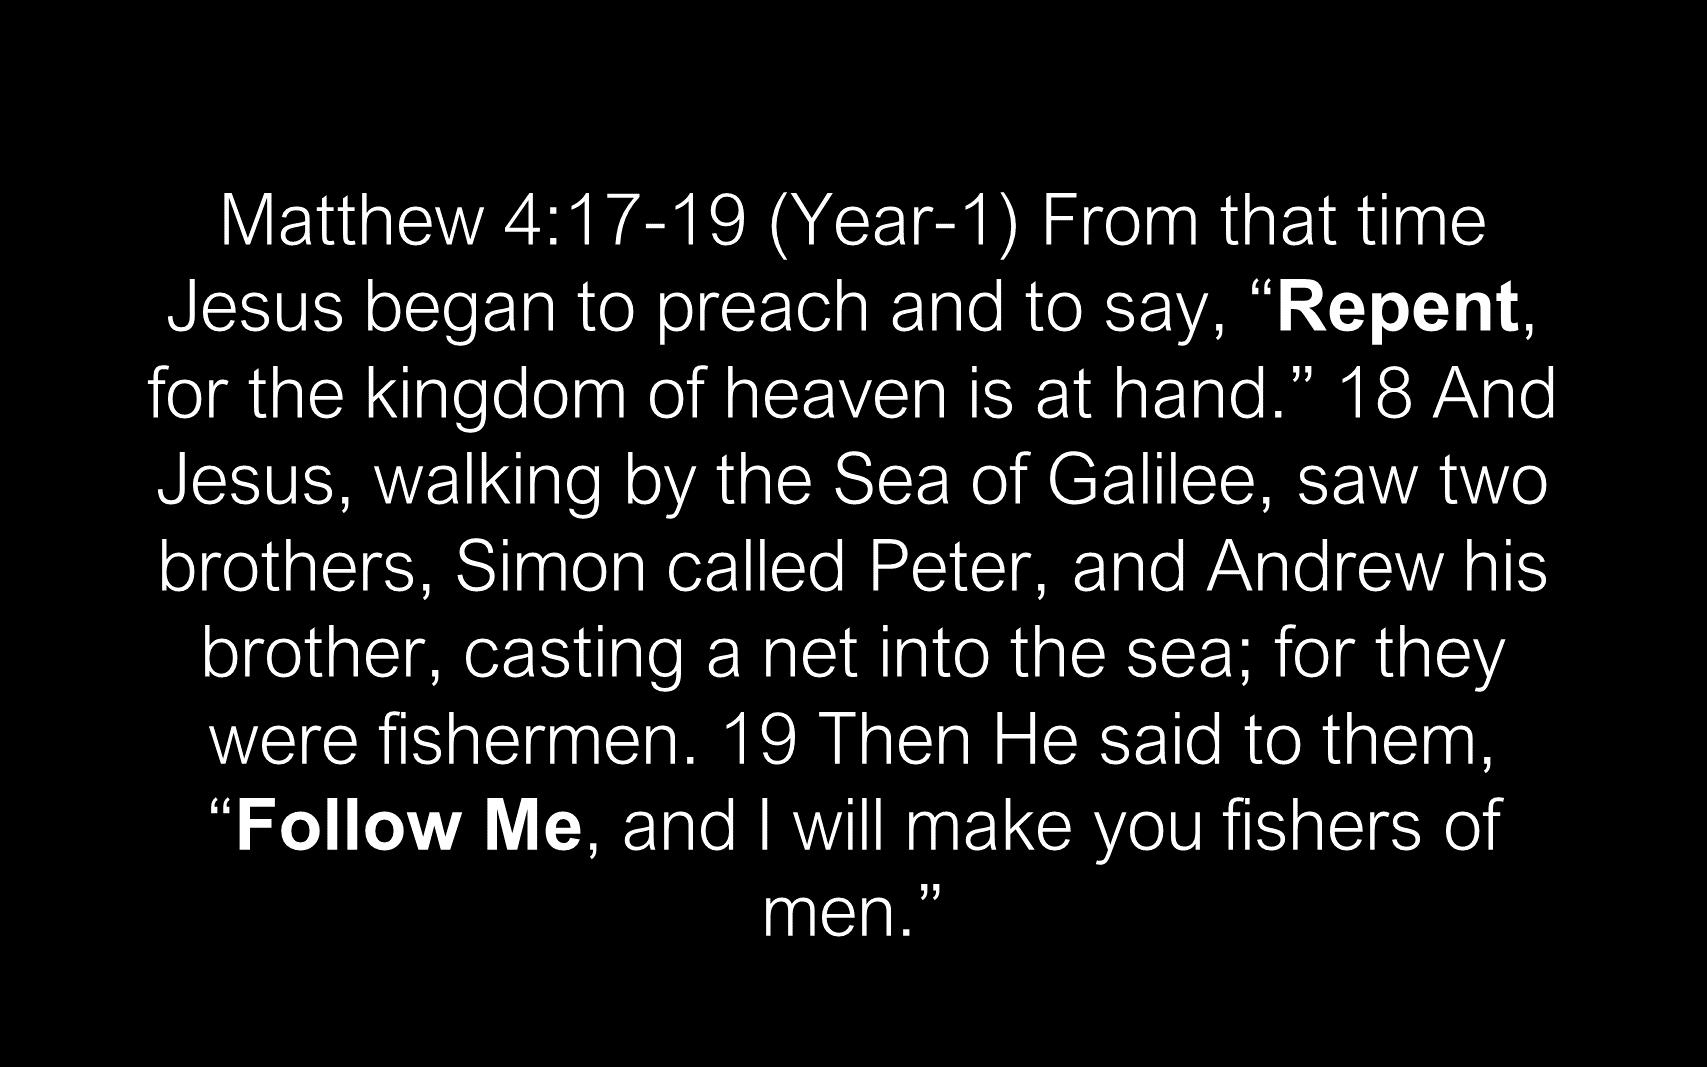 ESH-11 - The Discipline Of Disciple-Making - Disciples - Follow Christ & Make Disciples (9)